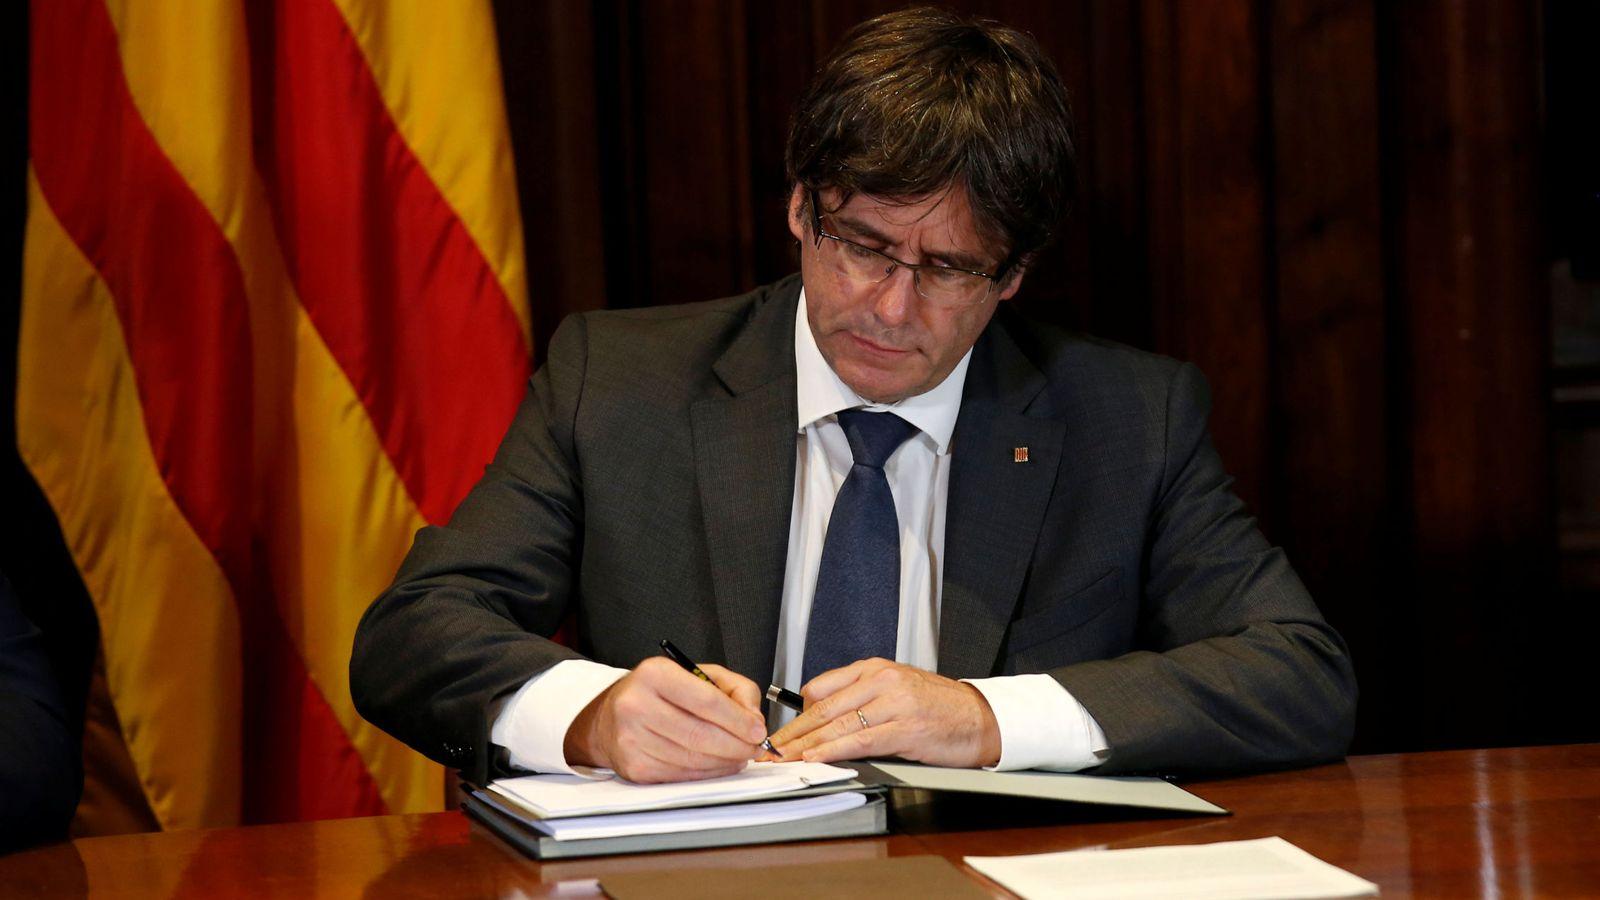 Foto: El presidente de Cataluña, Carles Puigdemont, firma el decreto de convocatoria del referéndum. (Reuters)